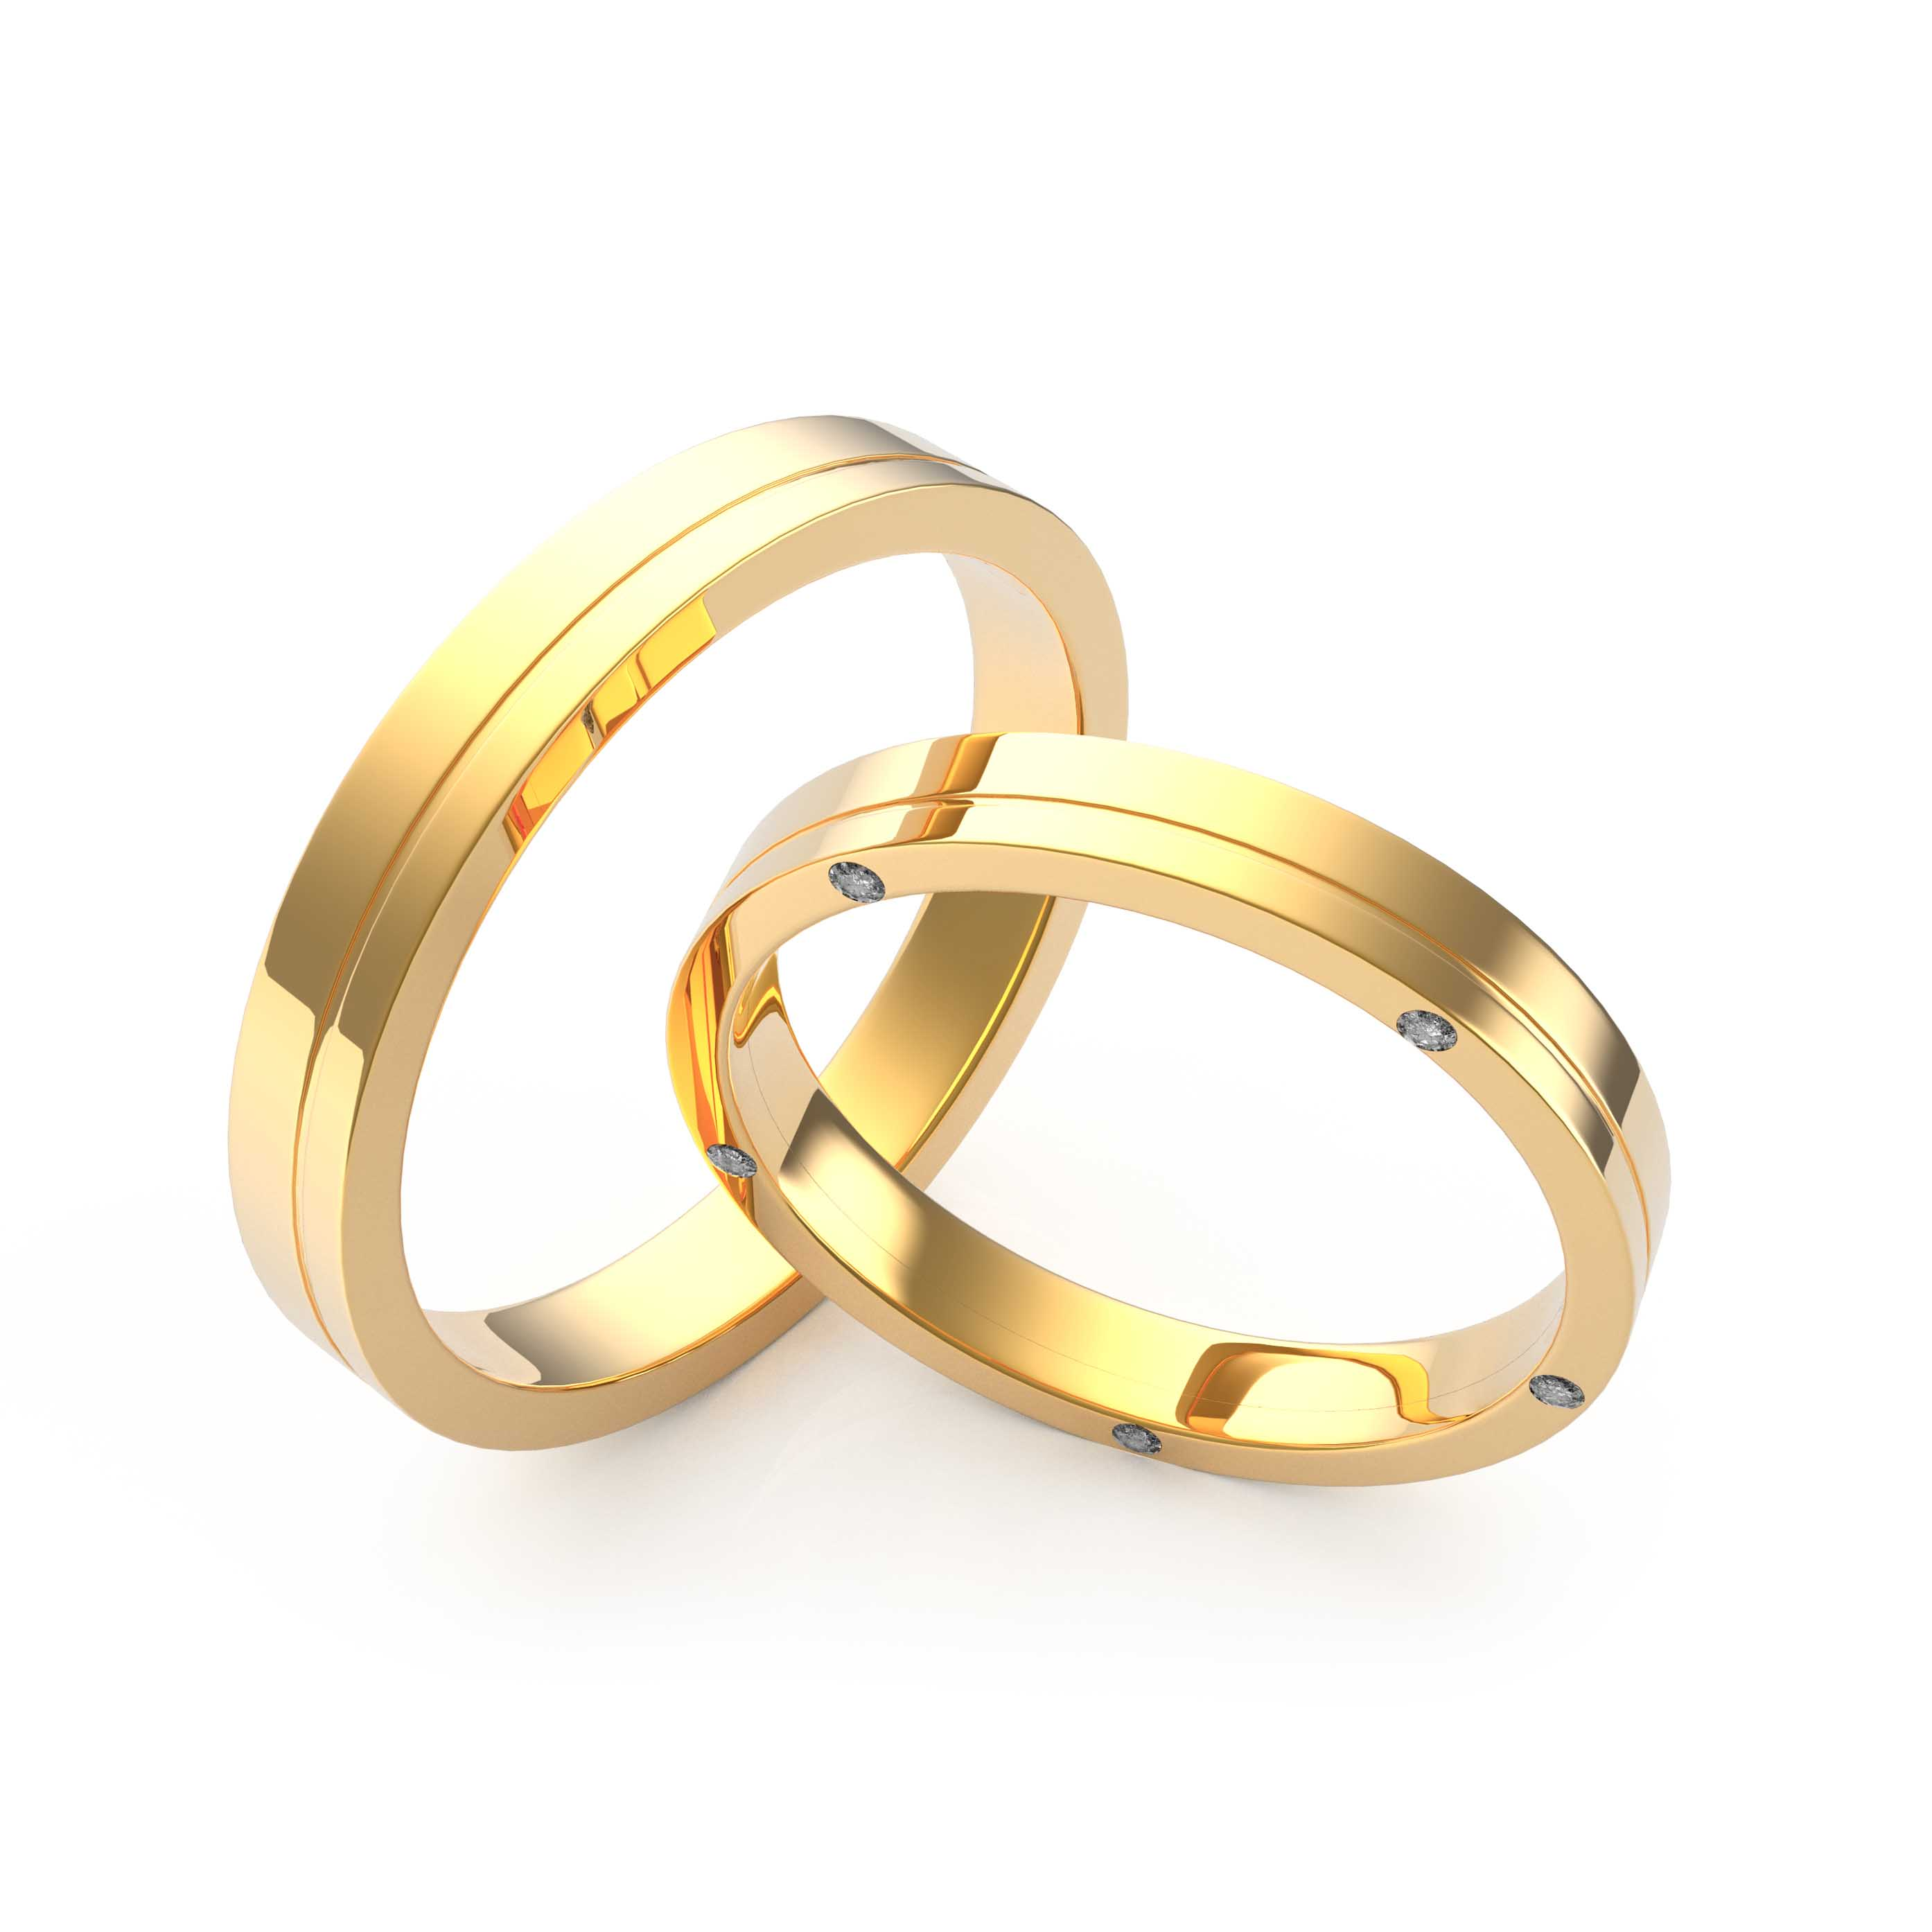 Rings Set Yellow Gold - 3D Model